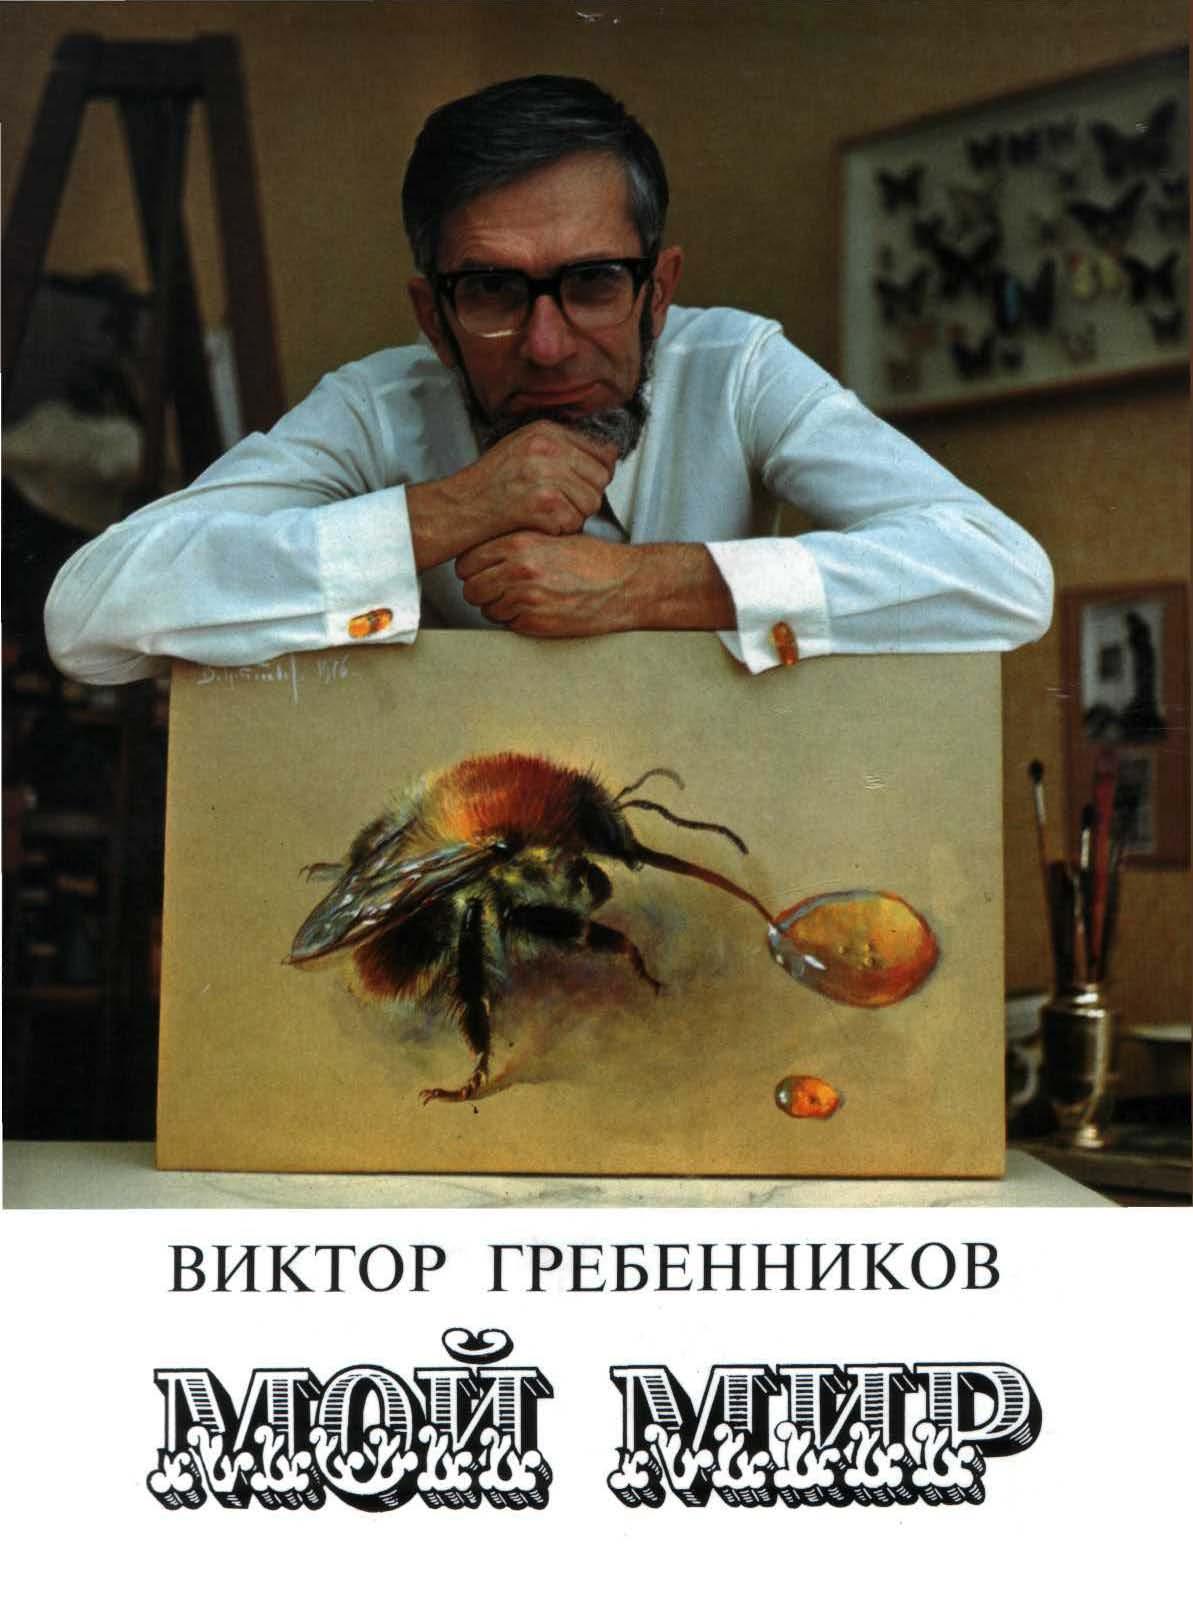 Viktor Grebennikov's Book - My World - Мой Мир Виктор Гребенников